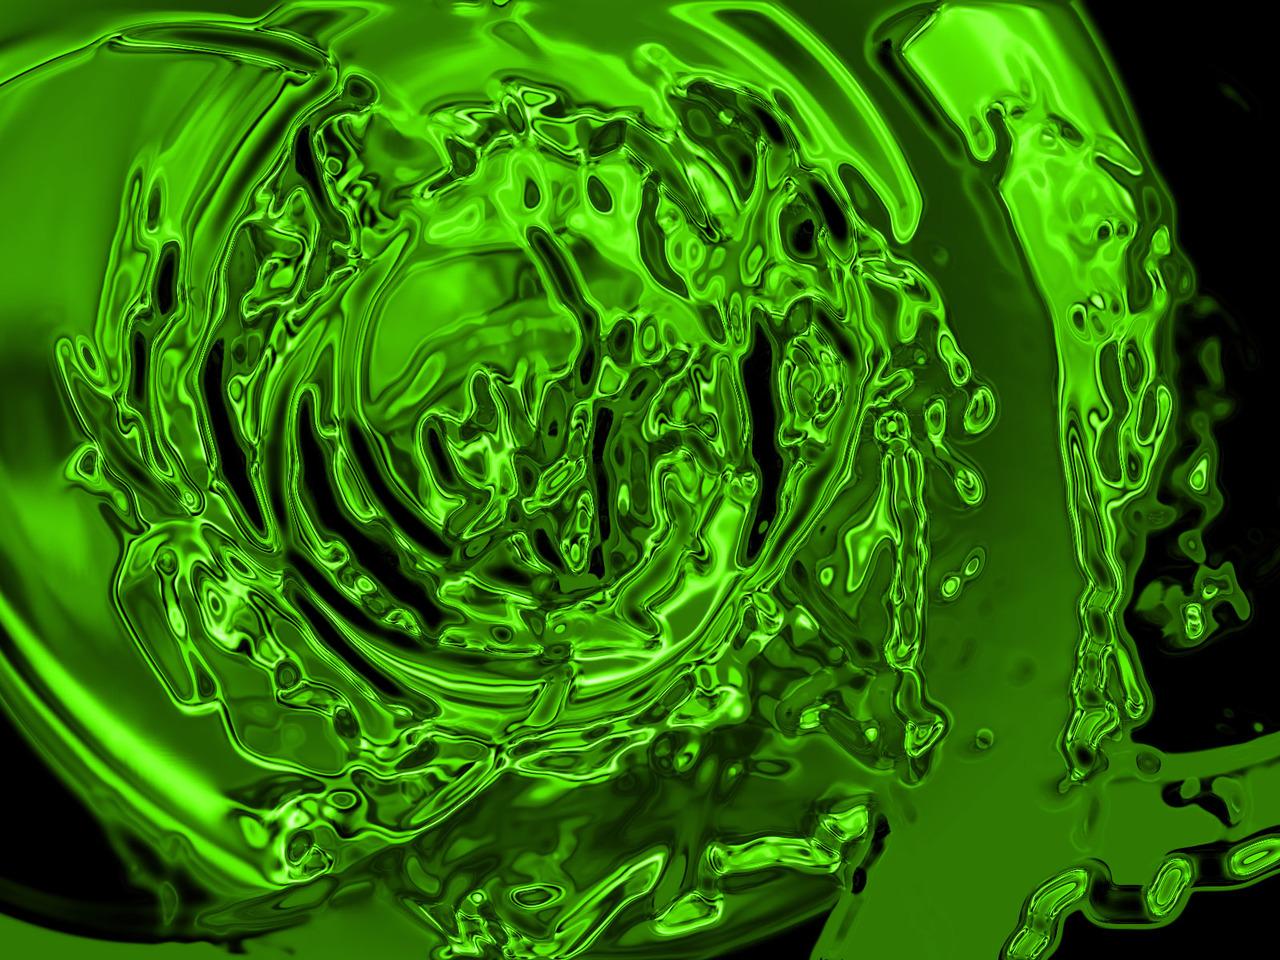 Green Metal 1280x960 wallpaper 1280x960